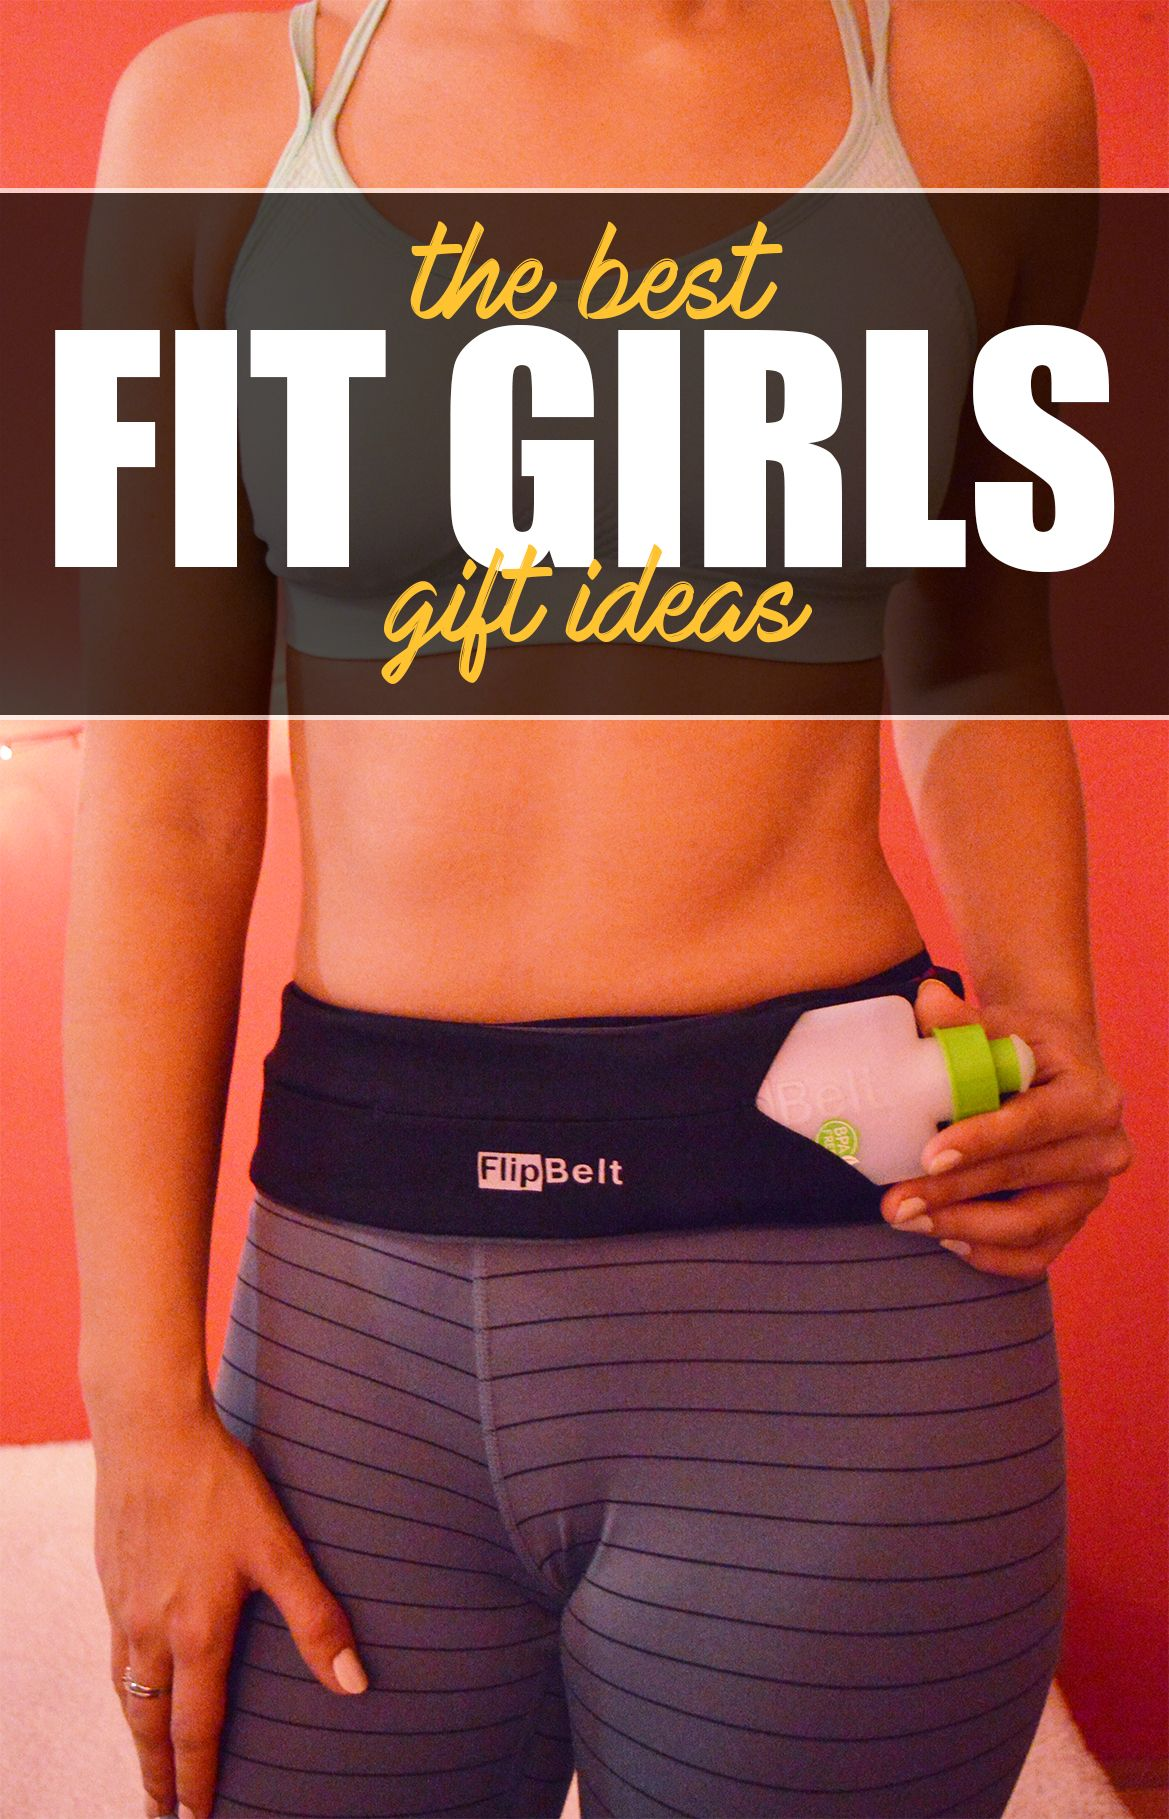 25-fitness-gift-ideas-the-best-fit-girls-christmas-presents-flip-belt-1